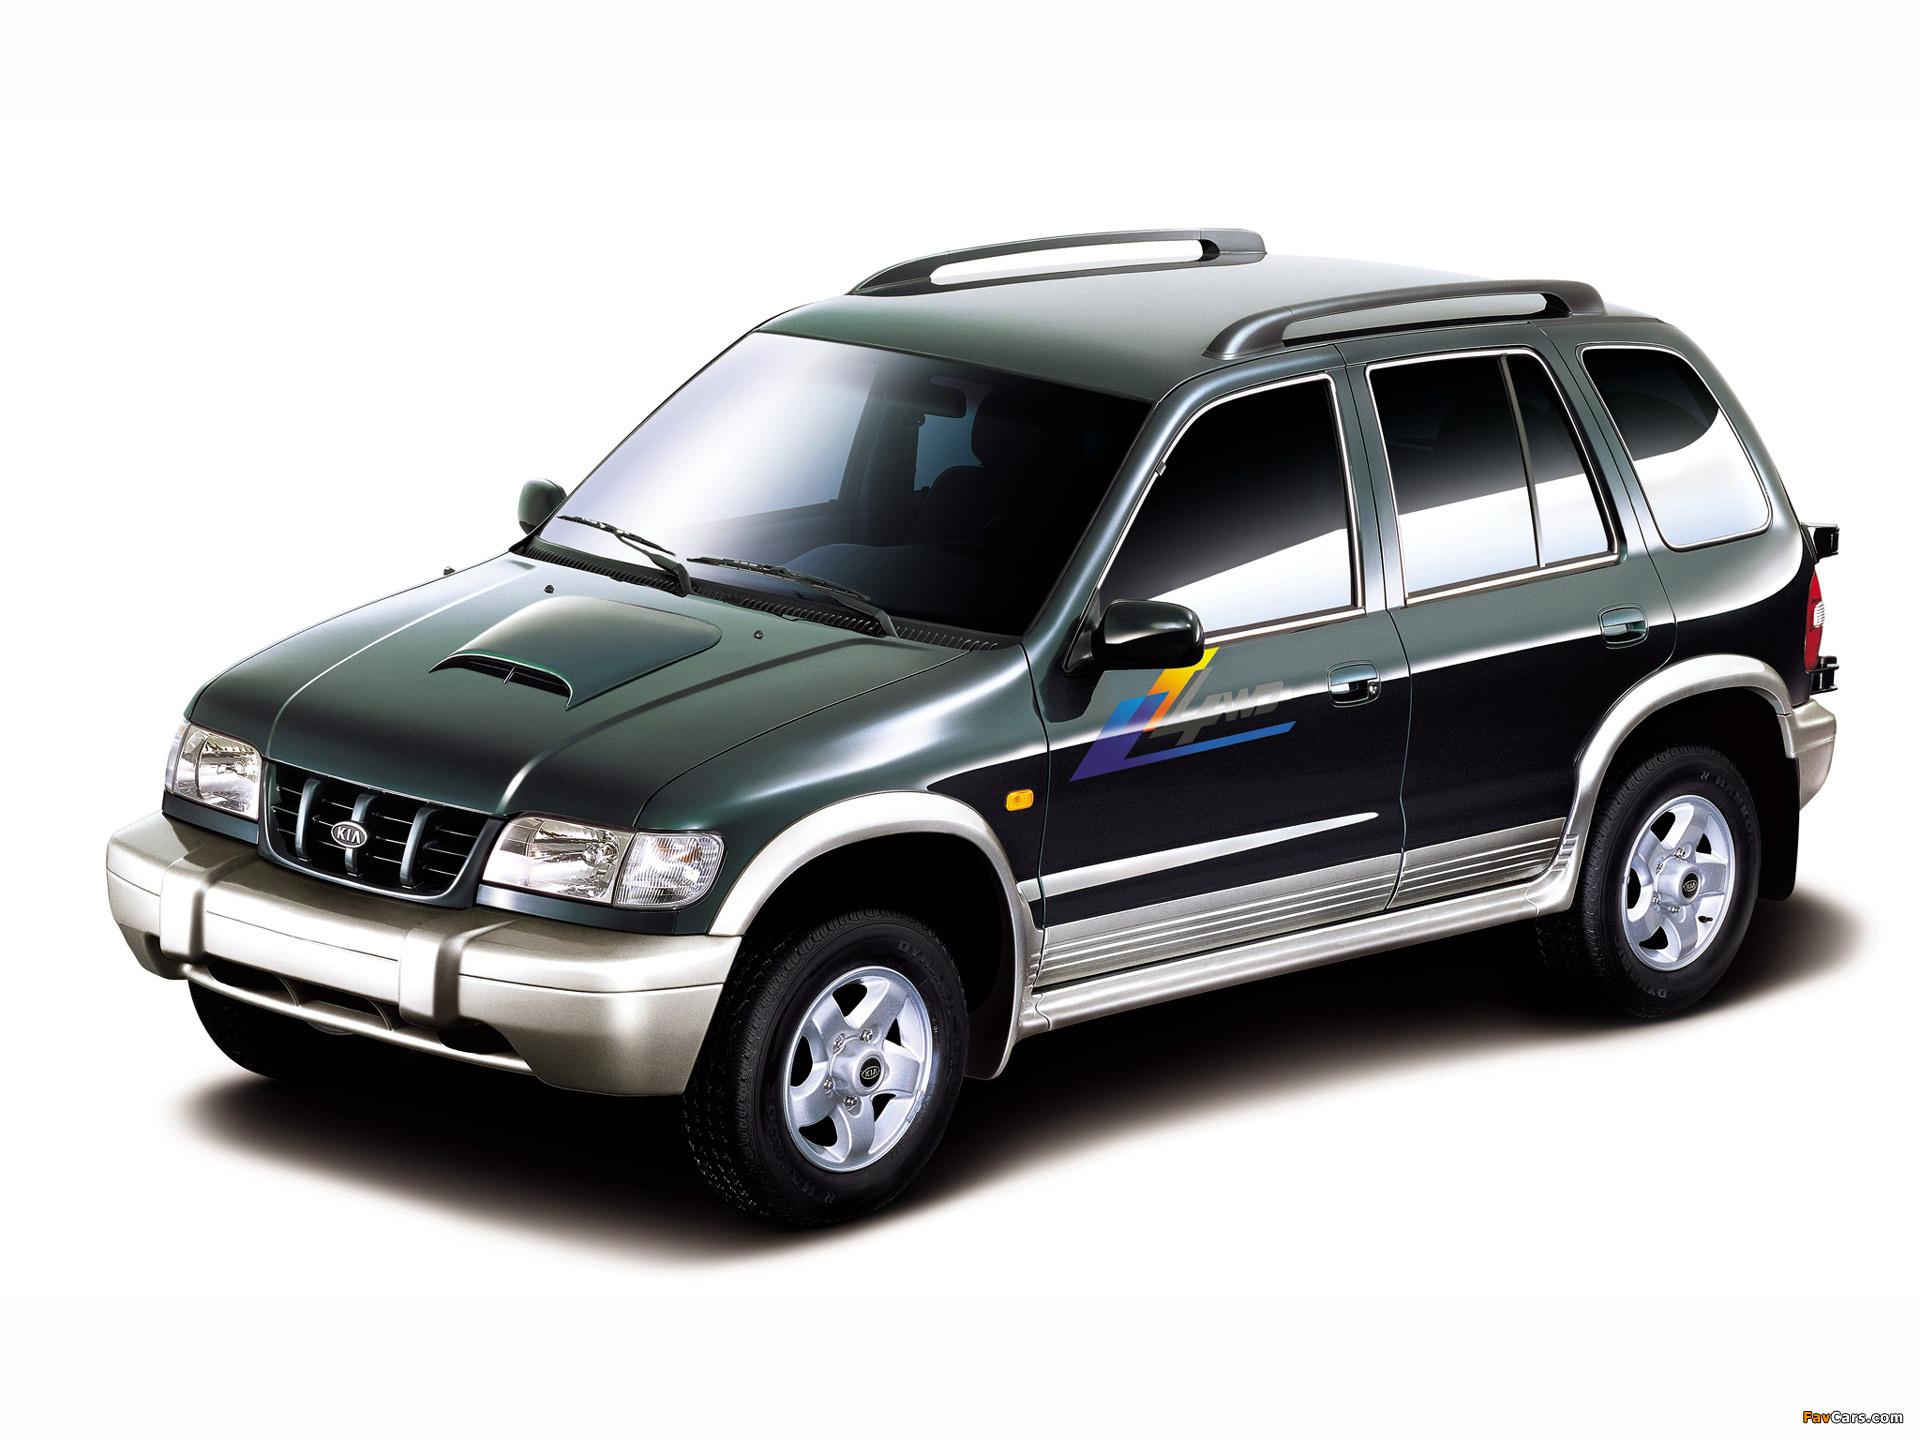 KIA Sportage I 1997-2006